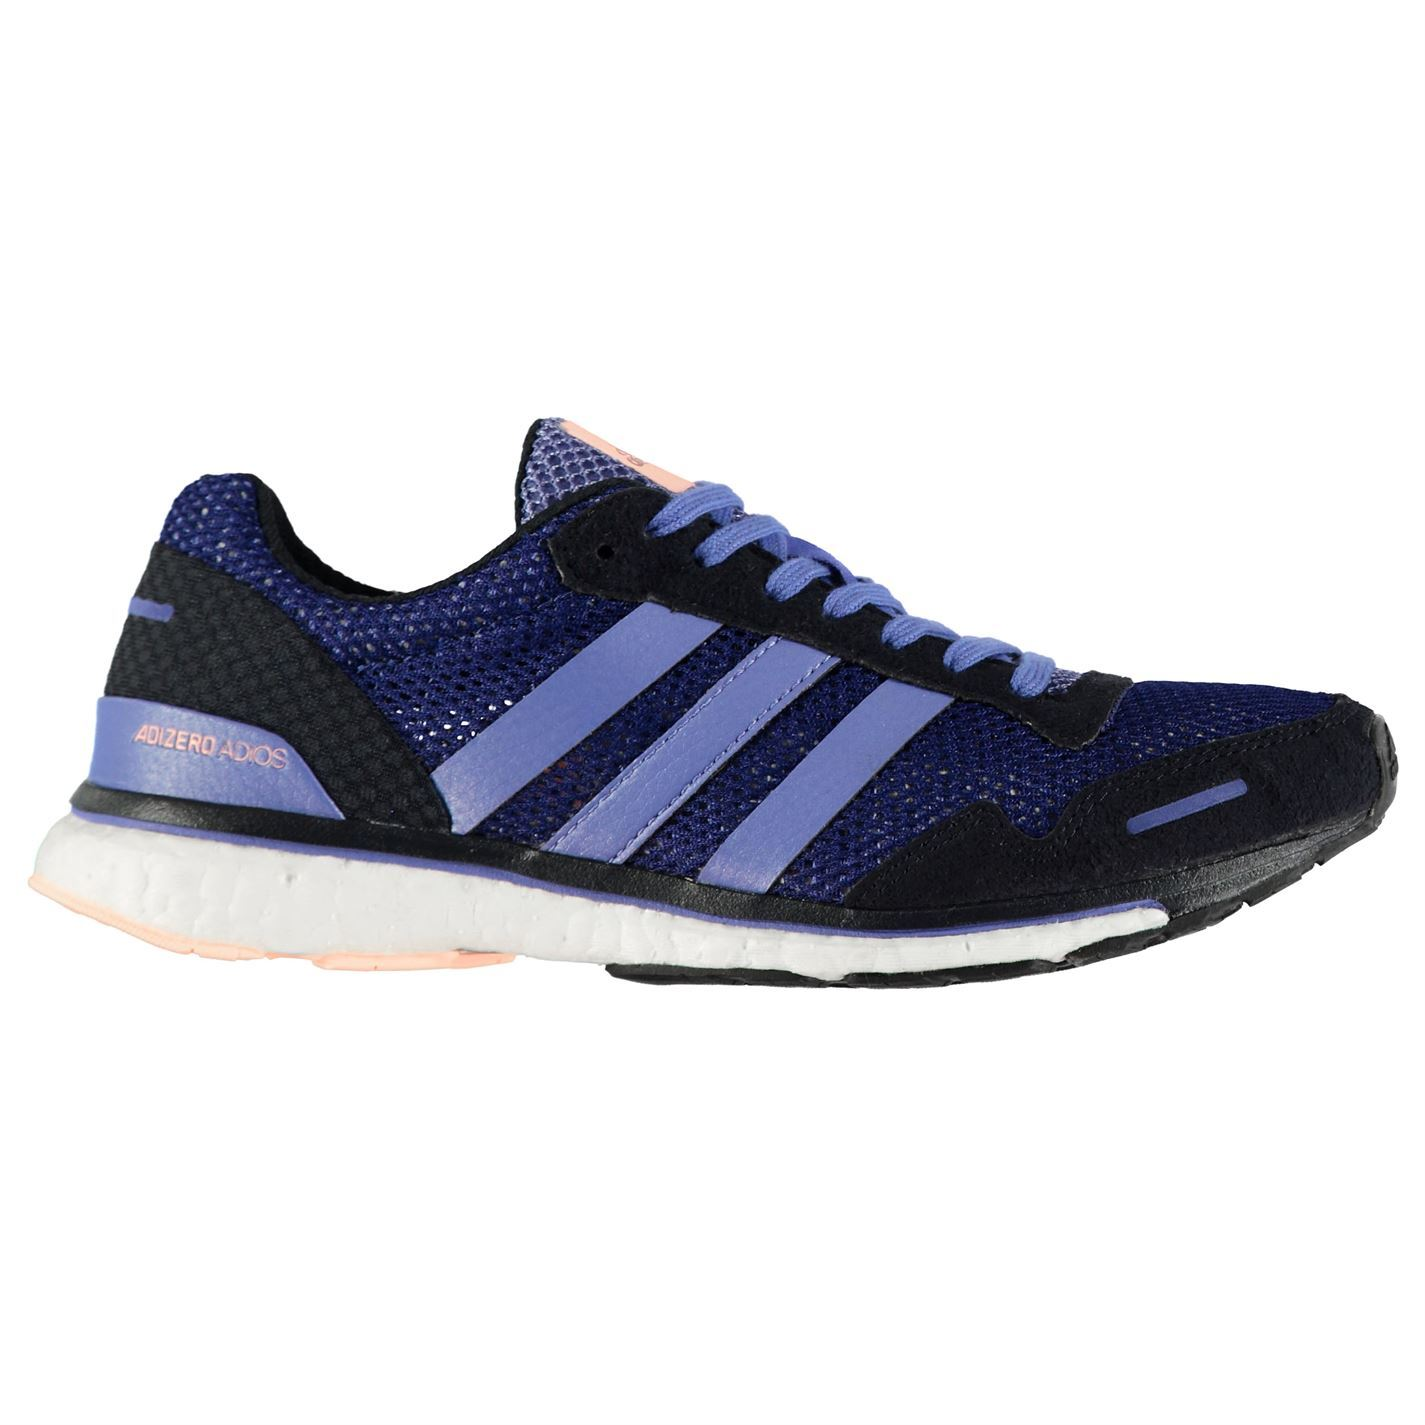 Adidas Damenss adizero atmungsaktive adios 3 laufschuhe straße atmungsaktive adizero leichte. 978ceb